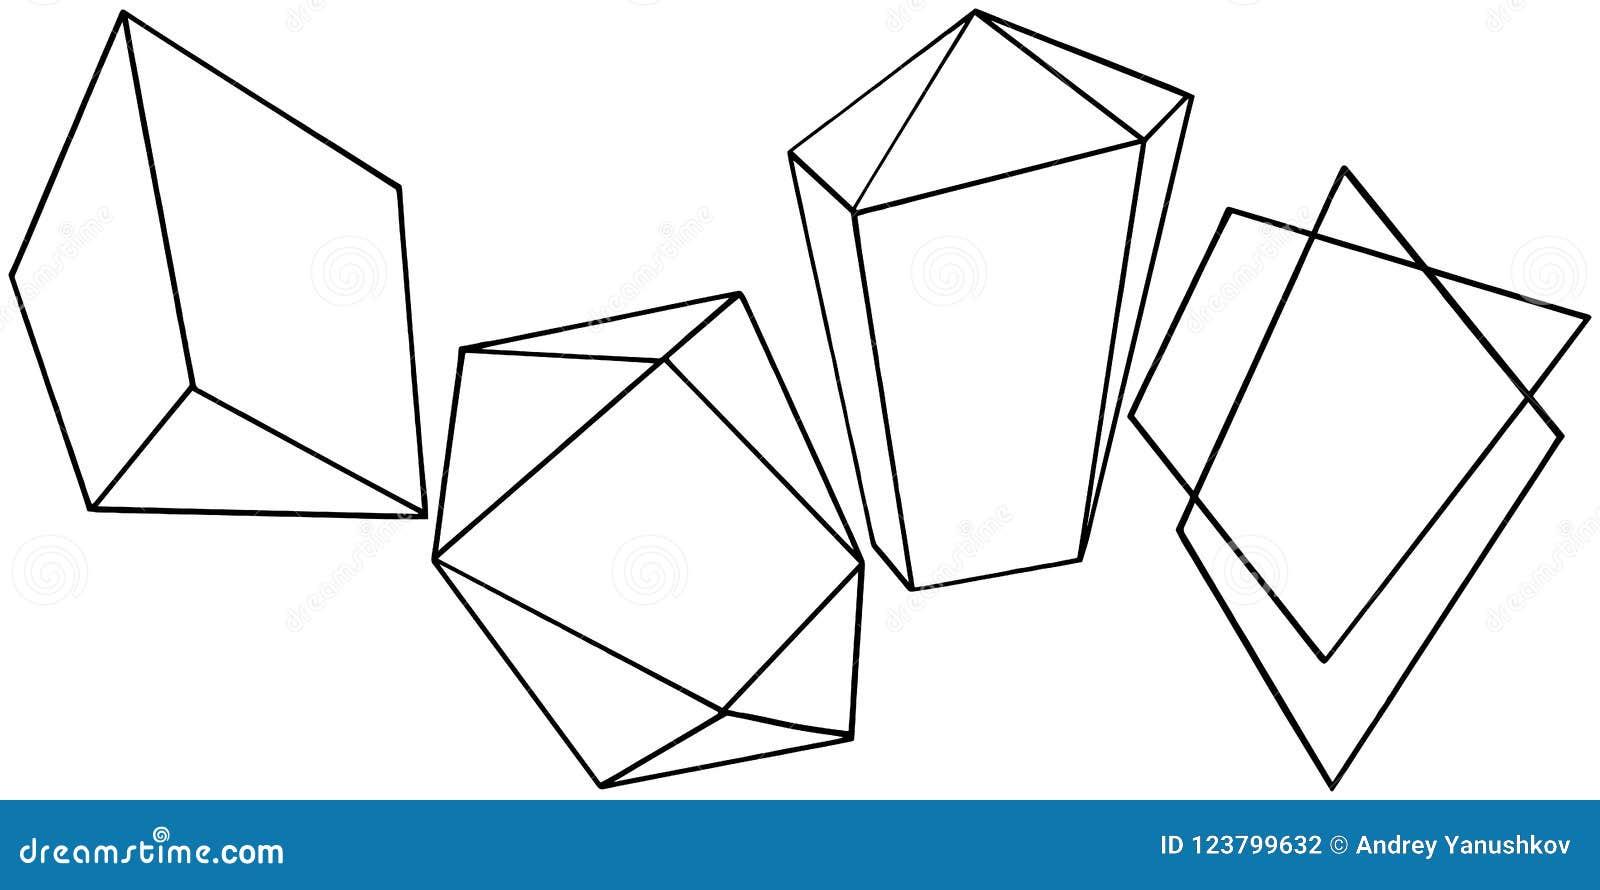 vector geometric form. isolated illustration element. mosaic shape